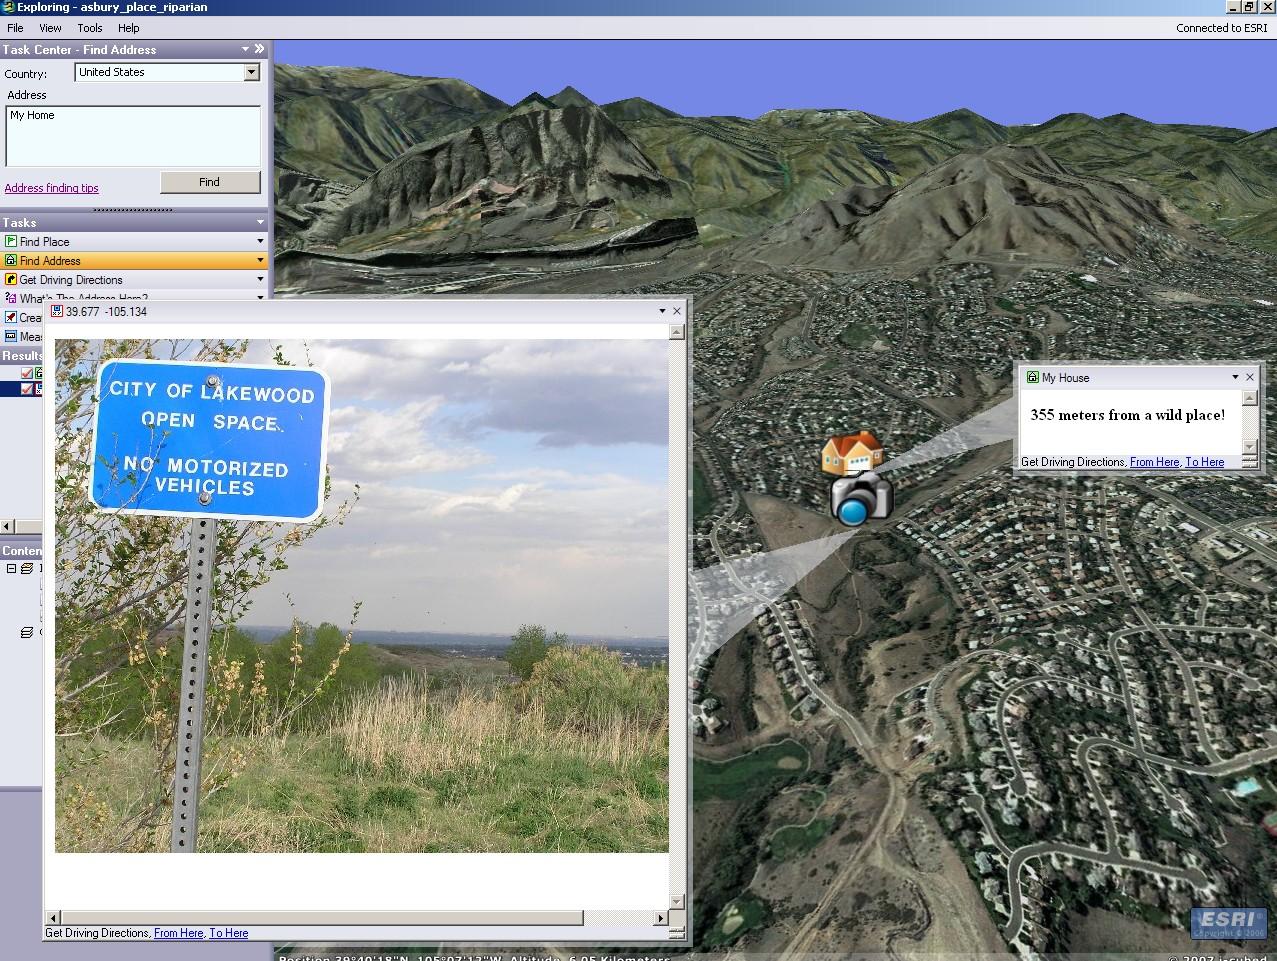 Example of ArcGIS Explorer software adding multimedia content.